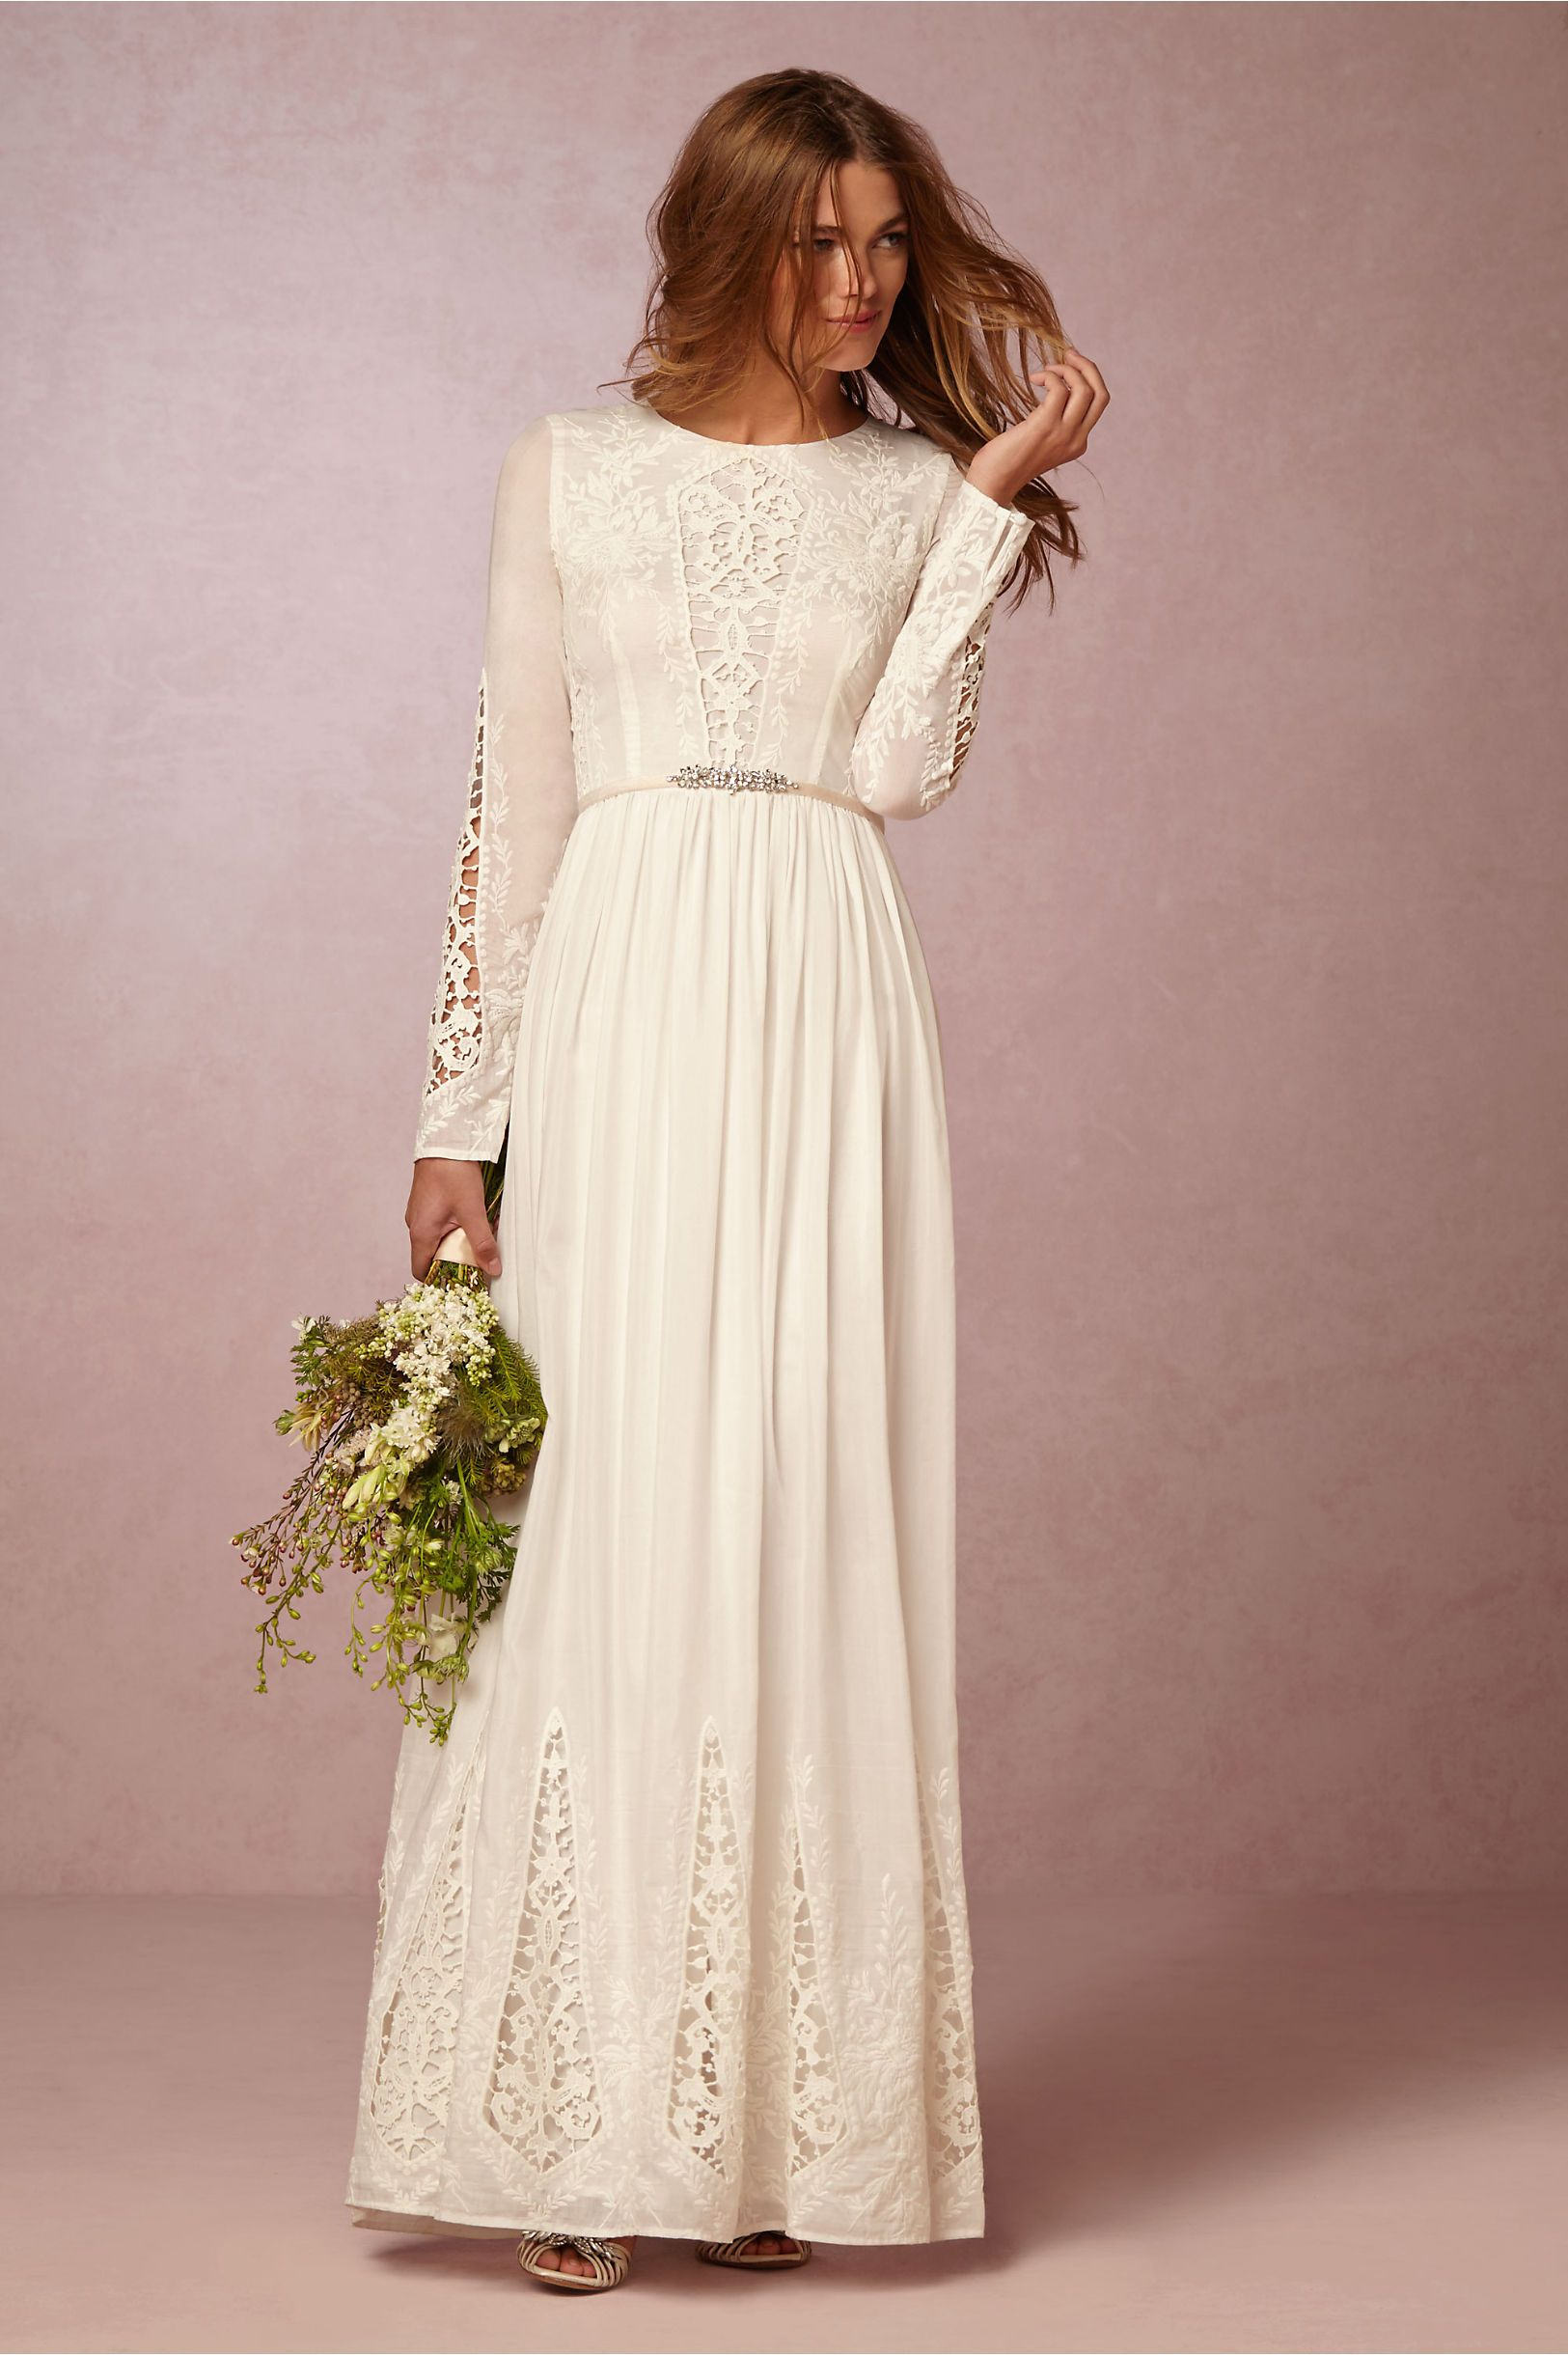 Mckenna day dress bohemian wedding dress and weddings